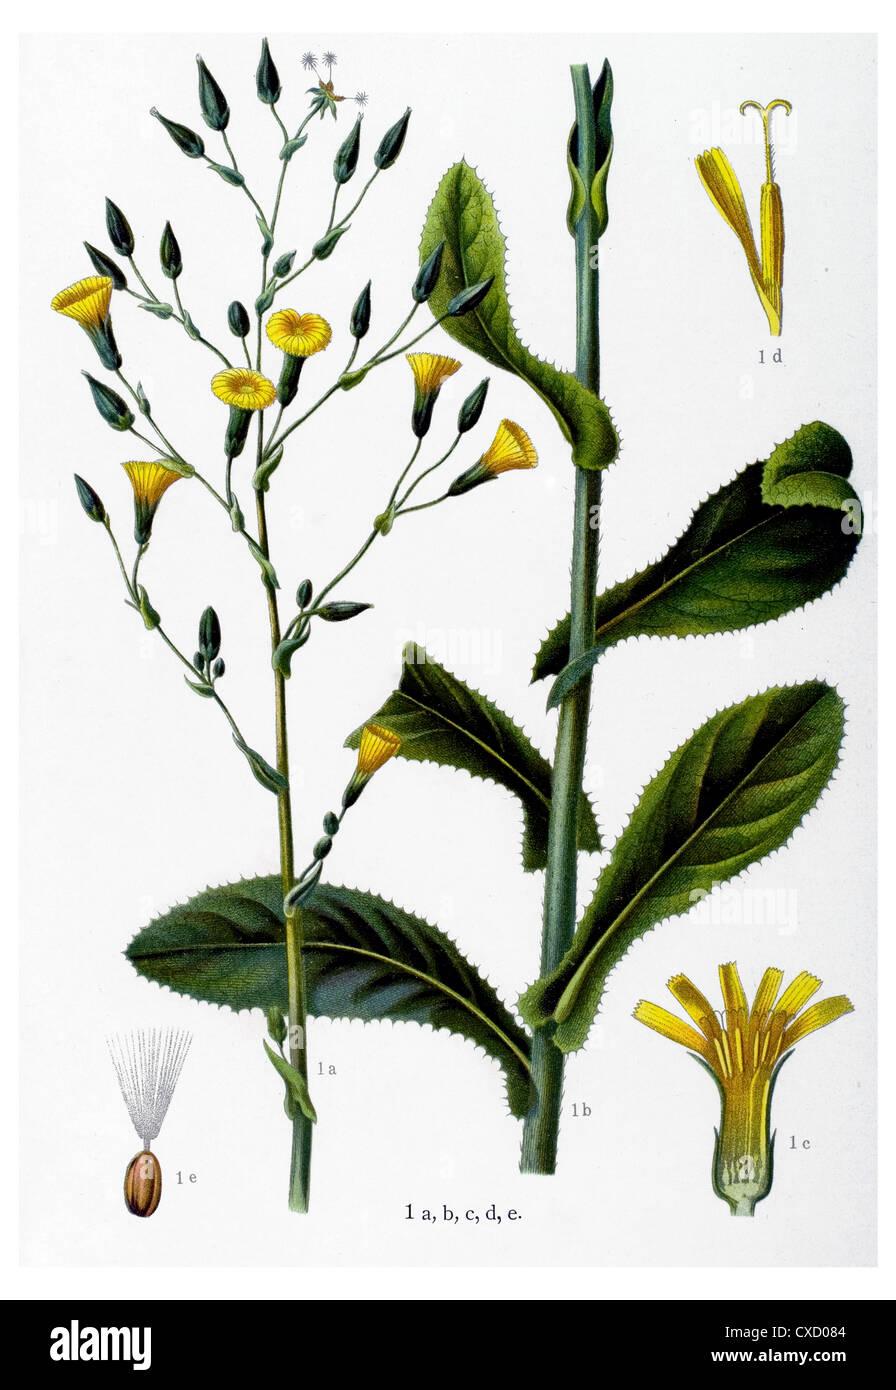 Lactuca virosa - Stock Image